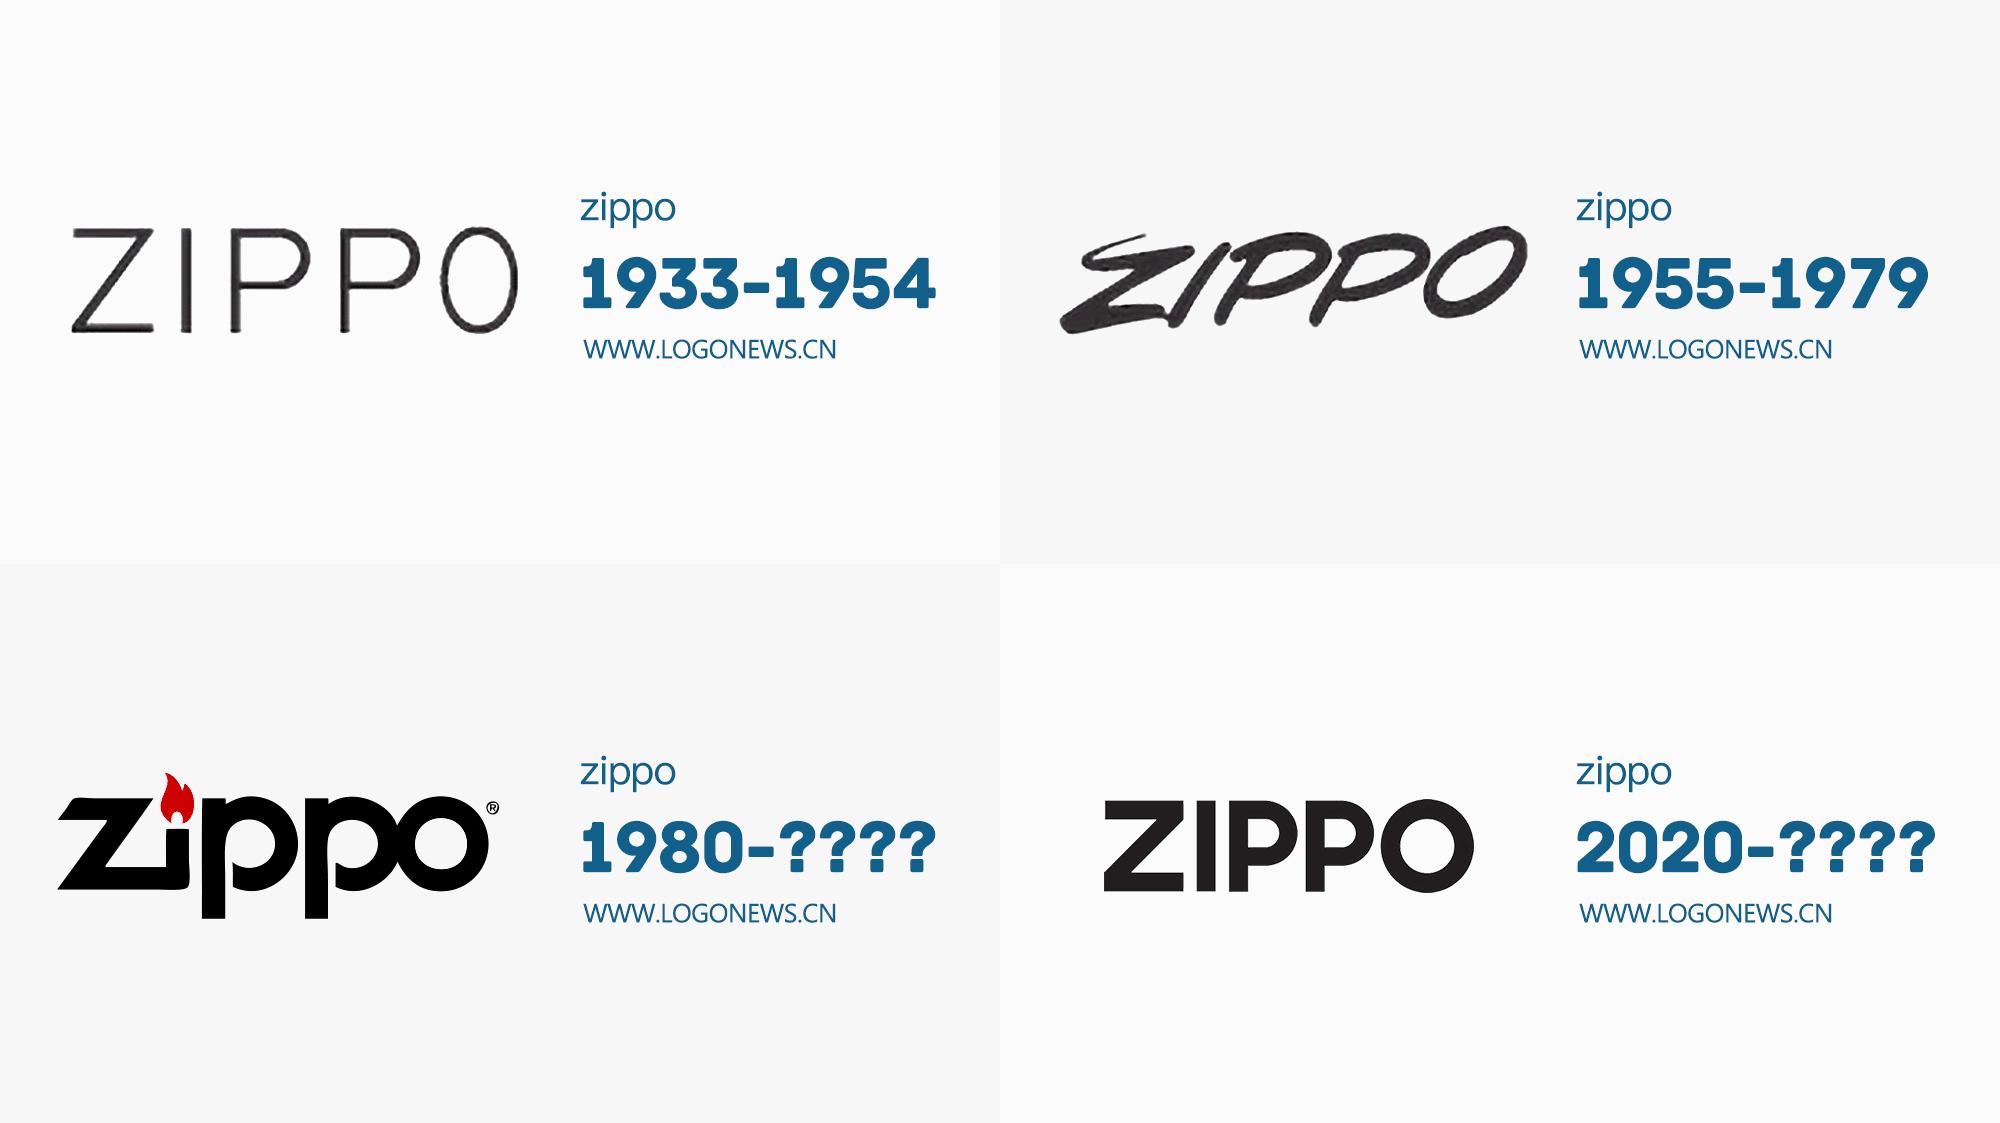 ZIPPO-野火设计|高端品牌设计工作室-上海品牌设计-上海VI设计-上海LOGO设计